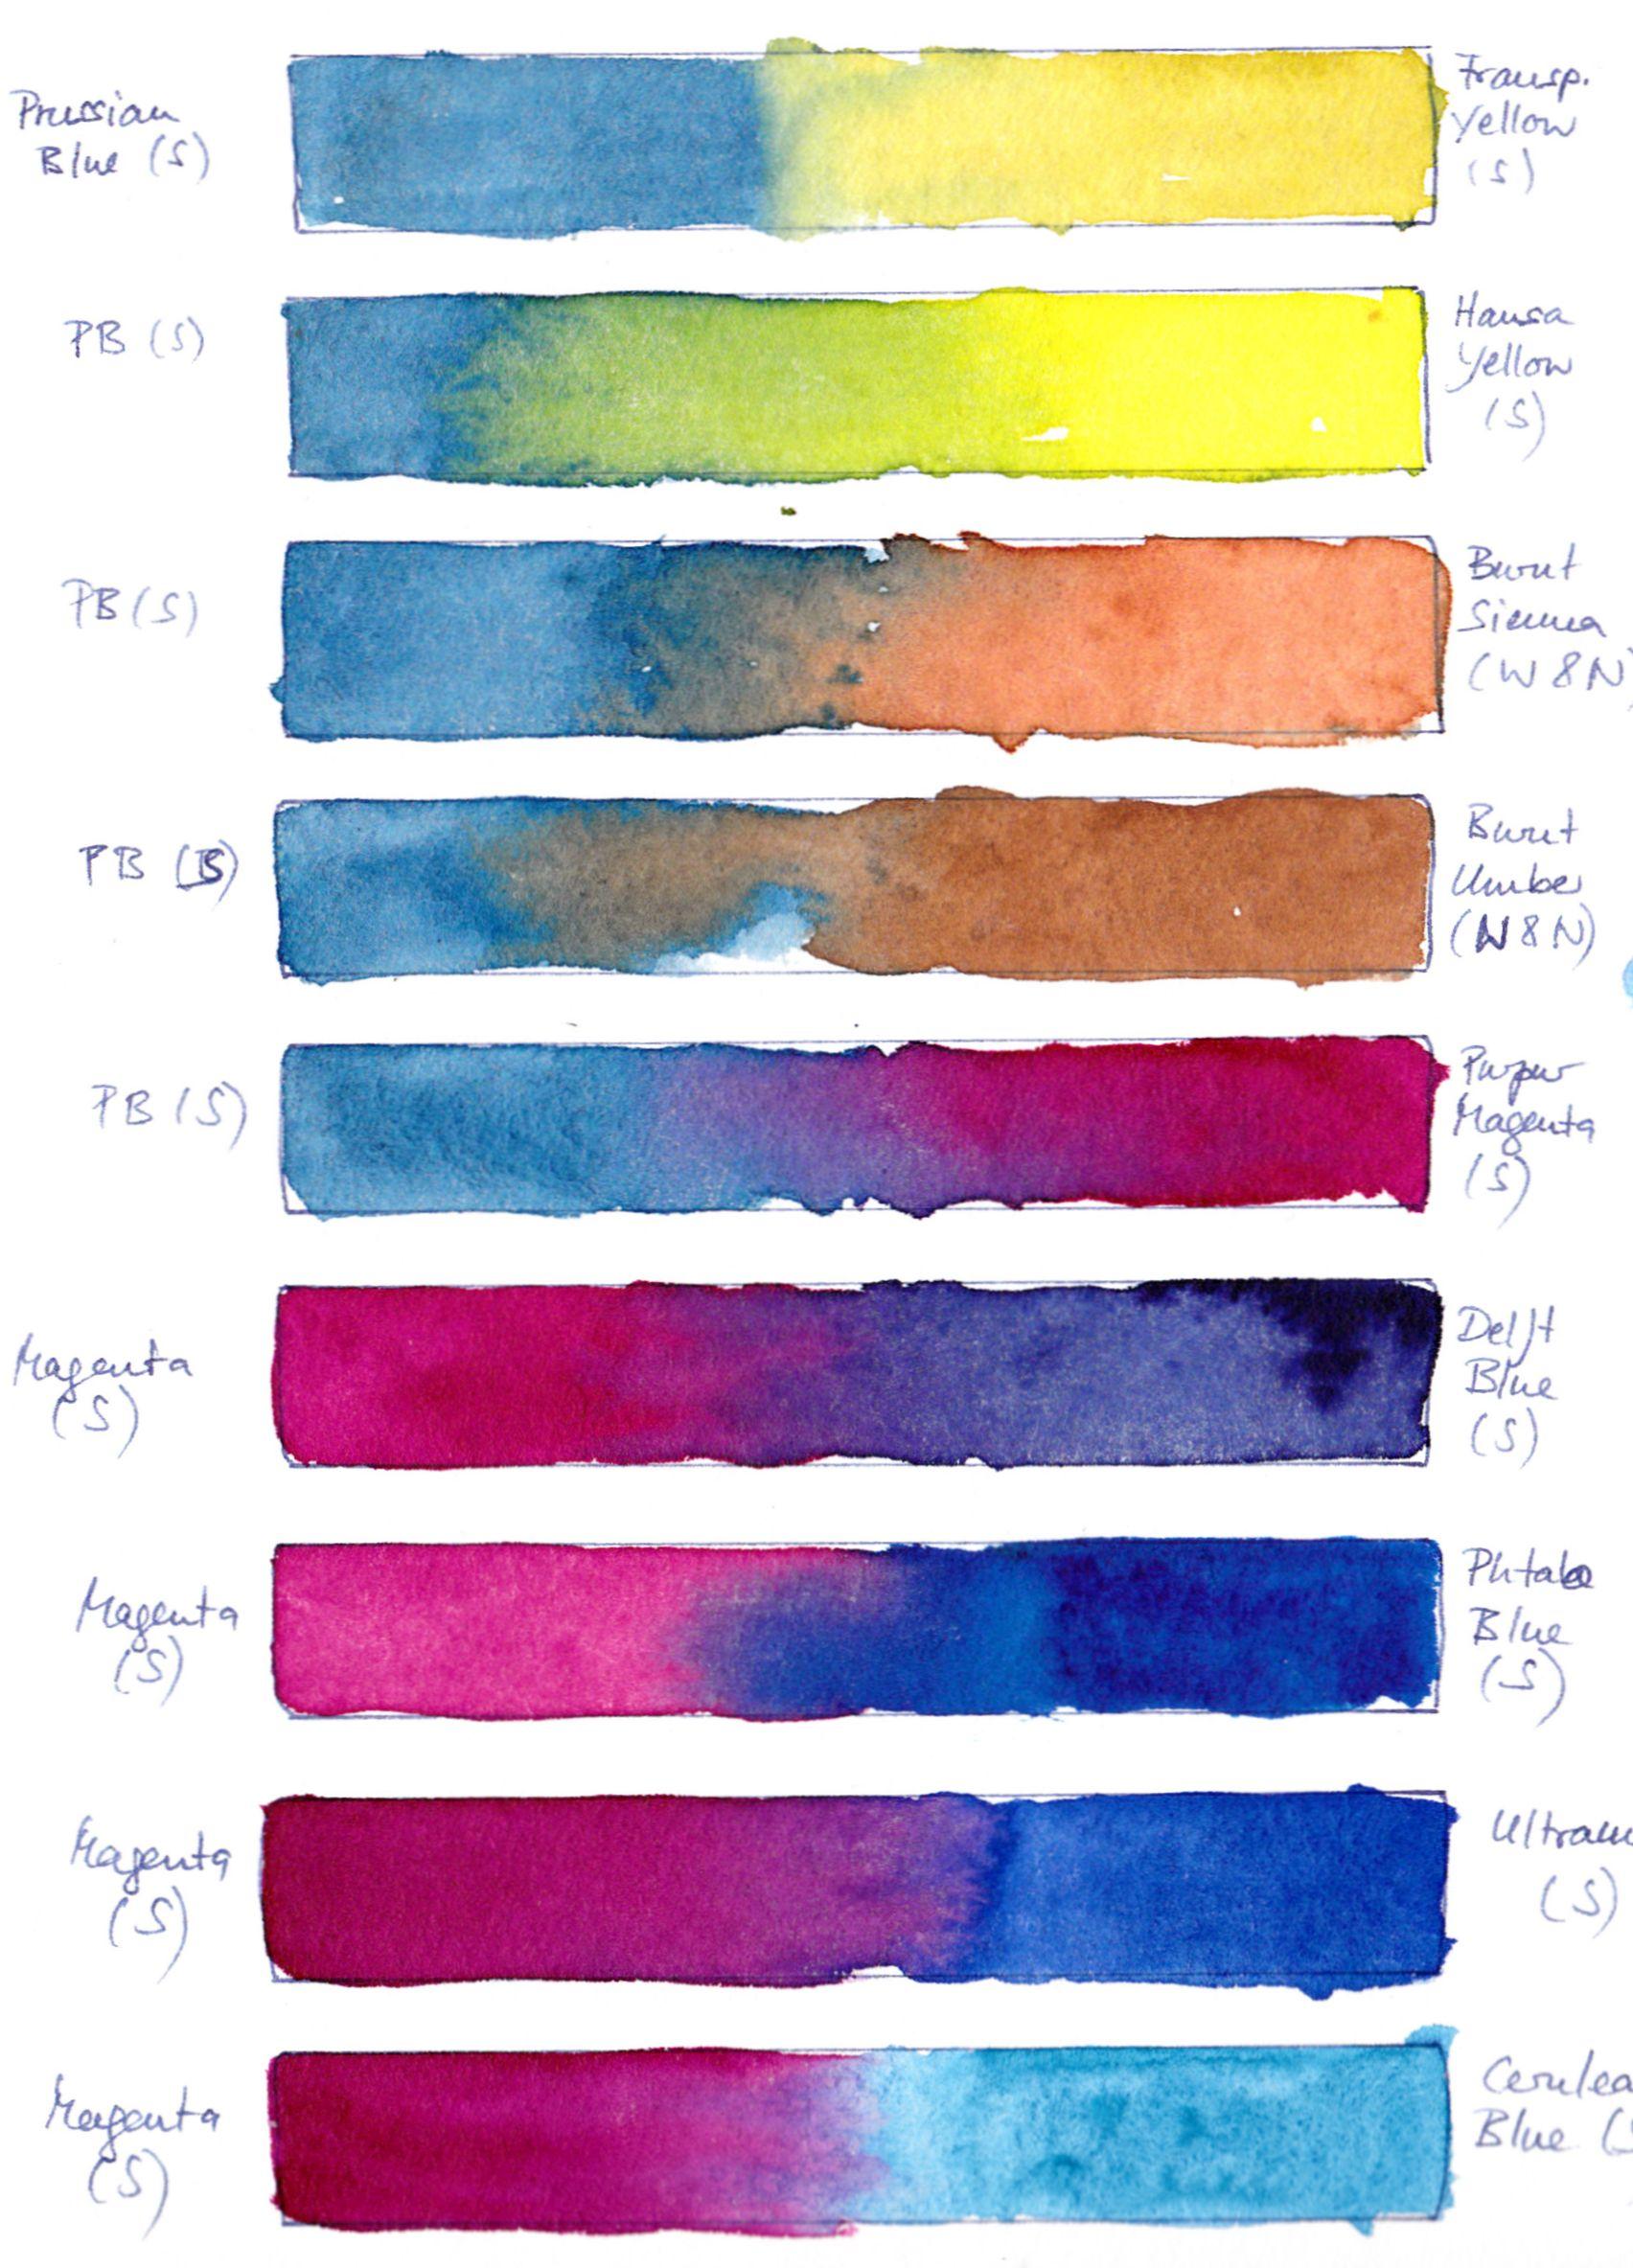 colourchart_2_1